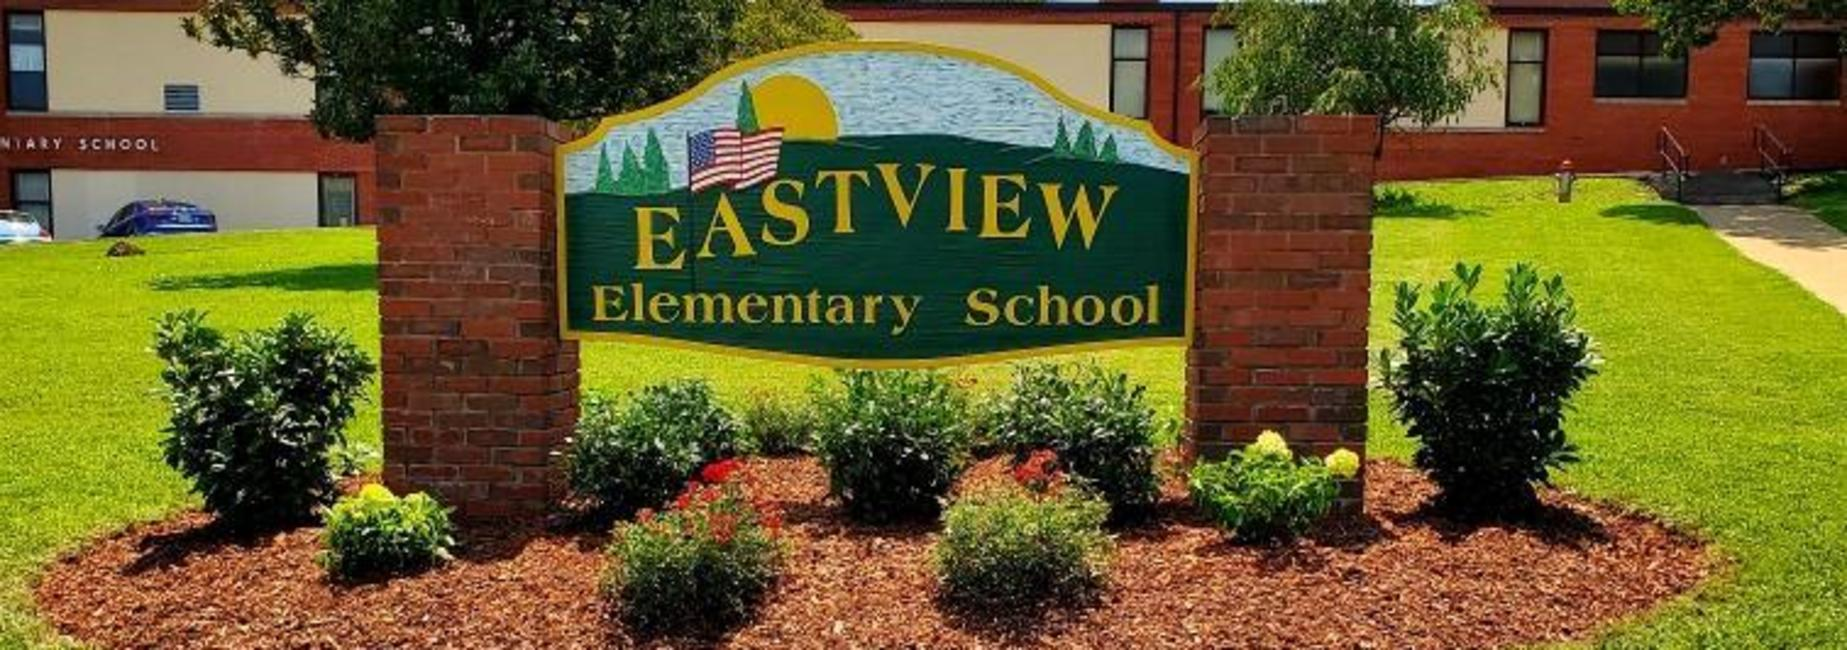 EastView Elementary Sign